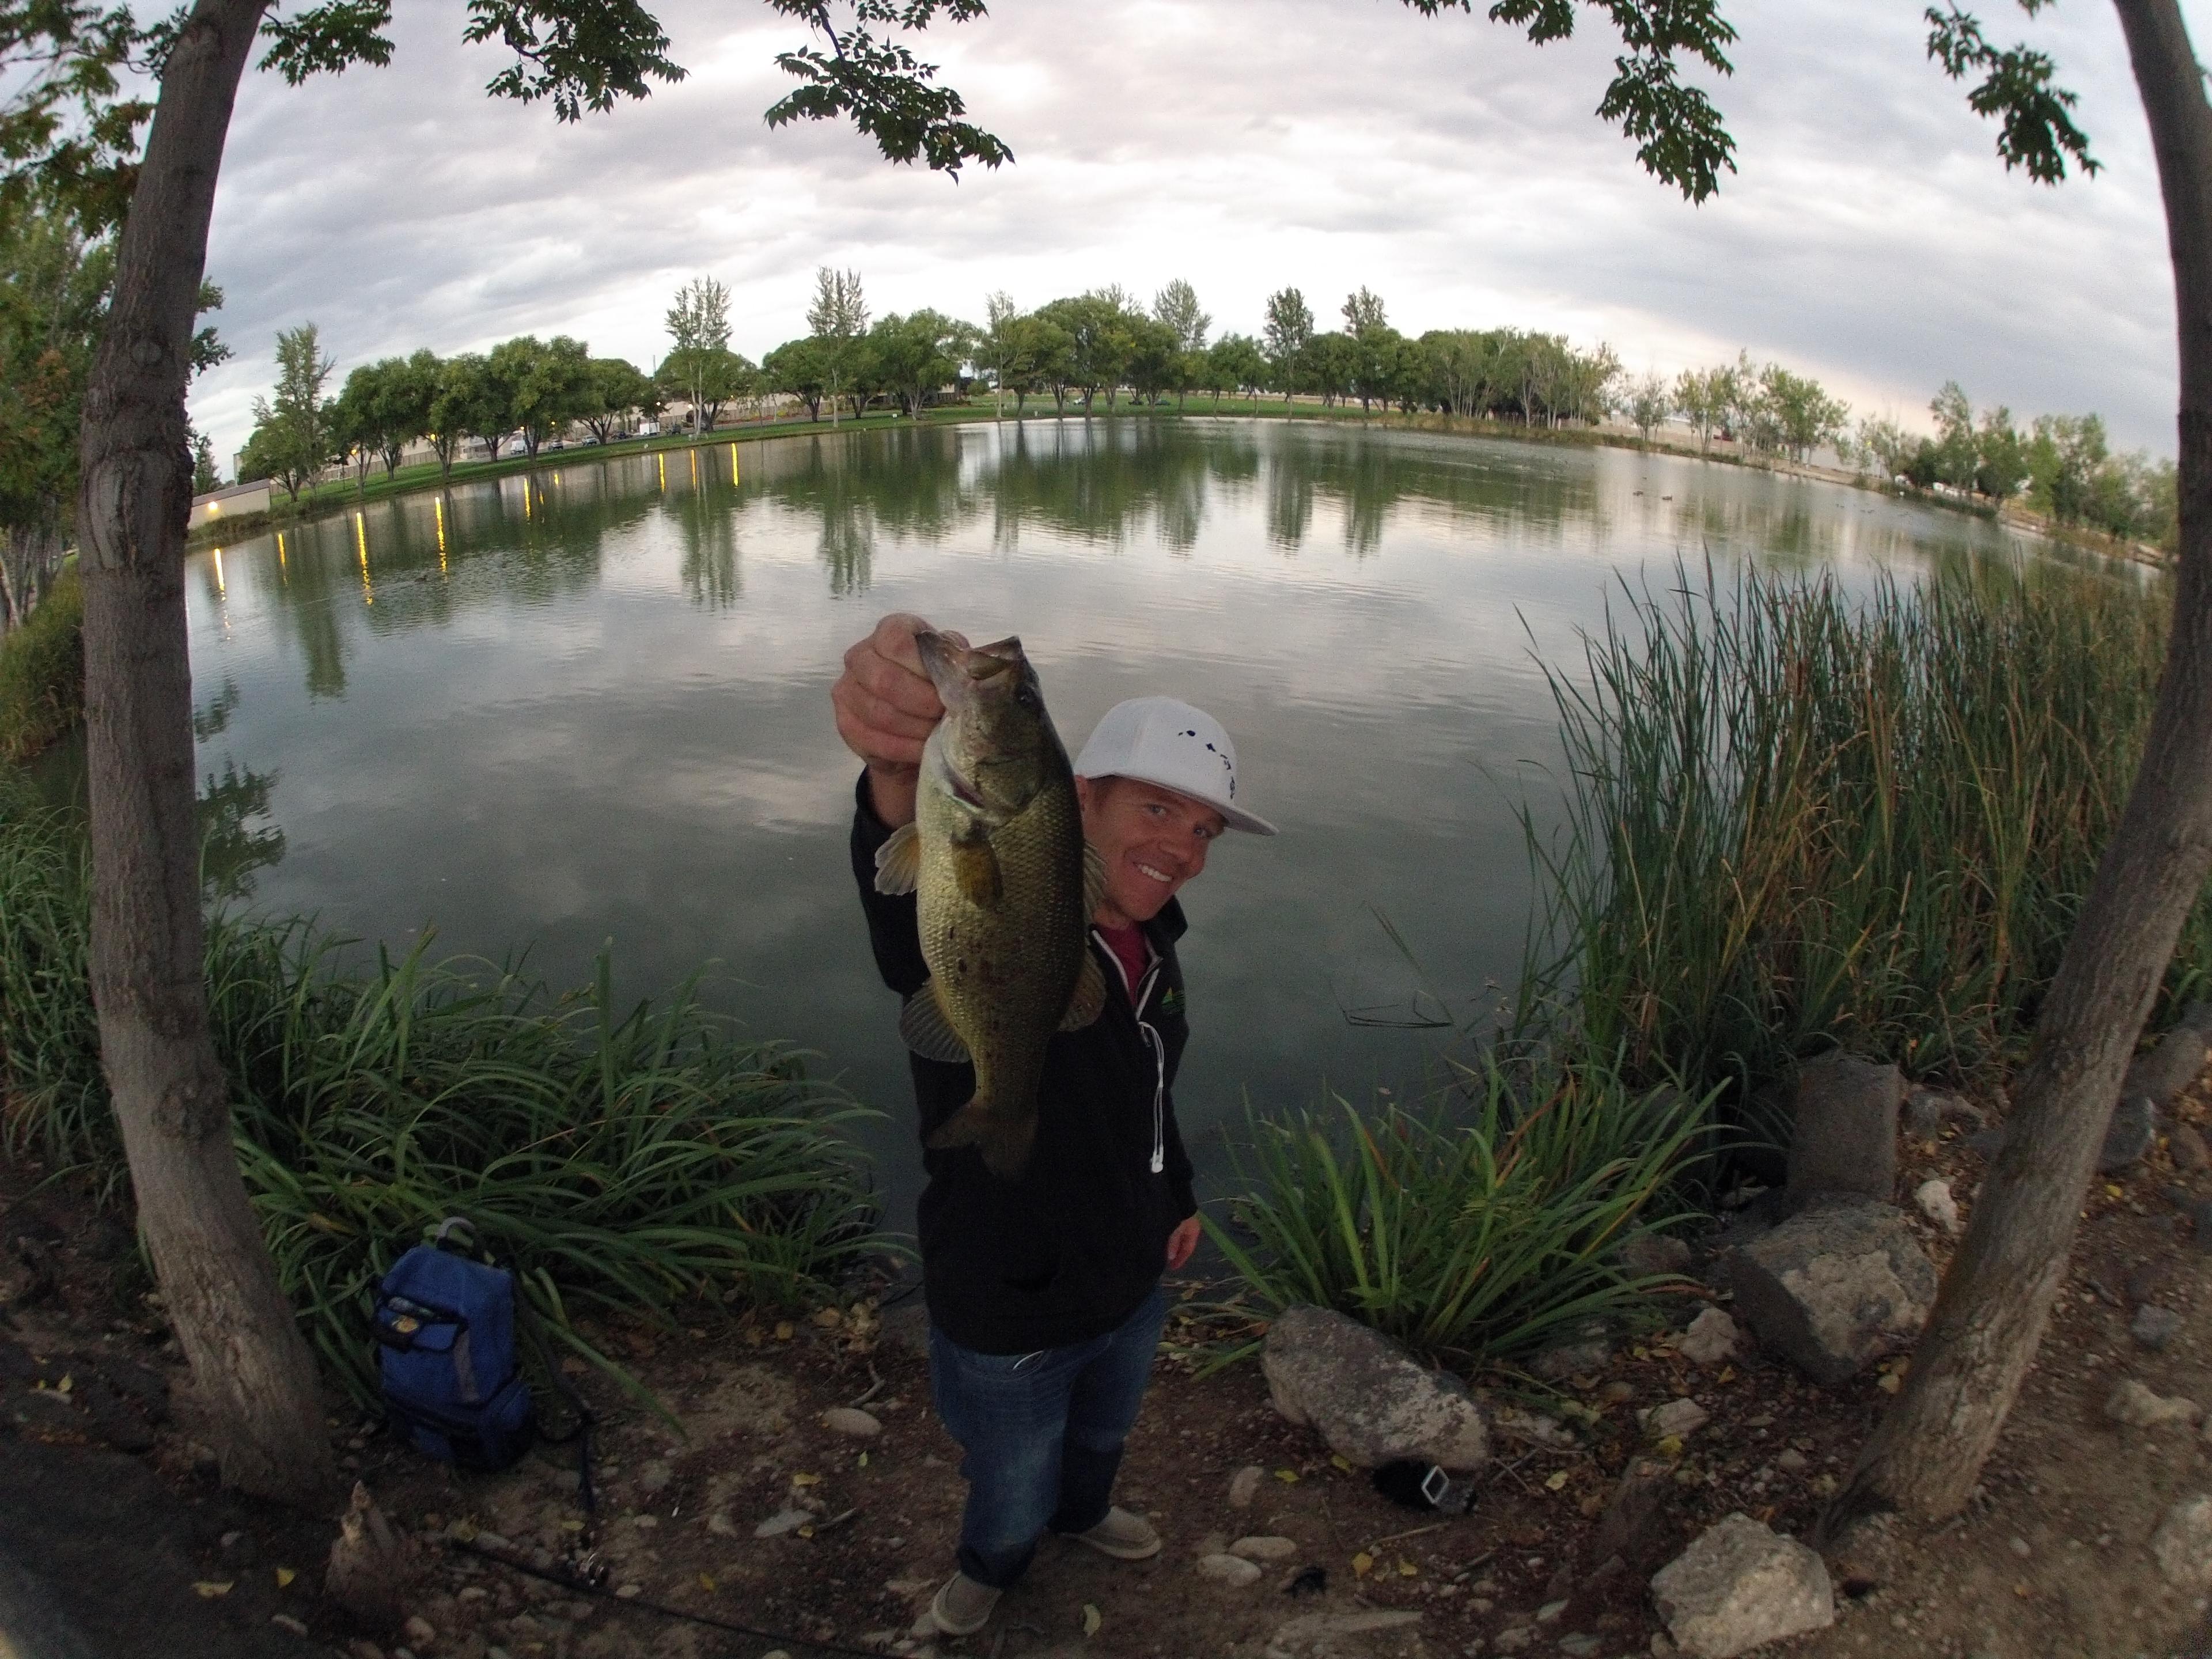 Bass fishing money saving tips for transportaion